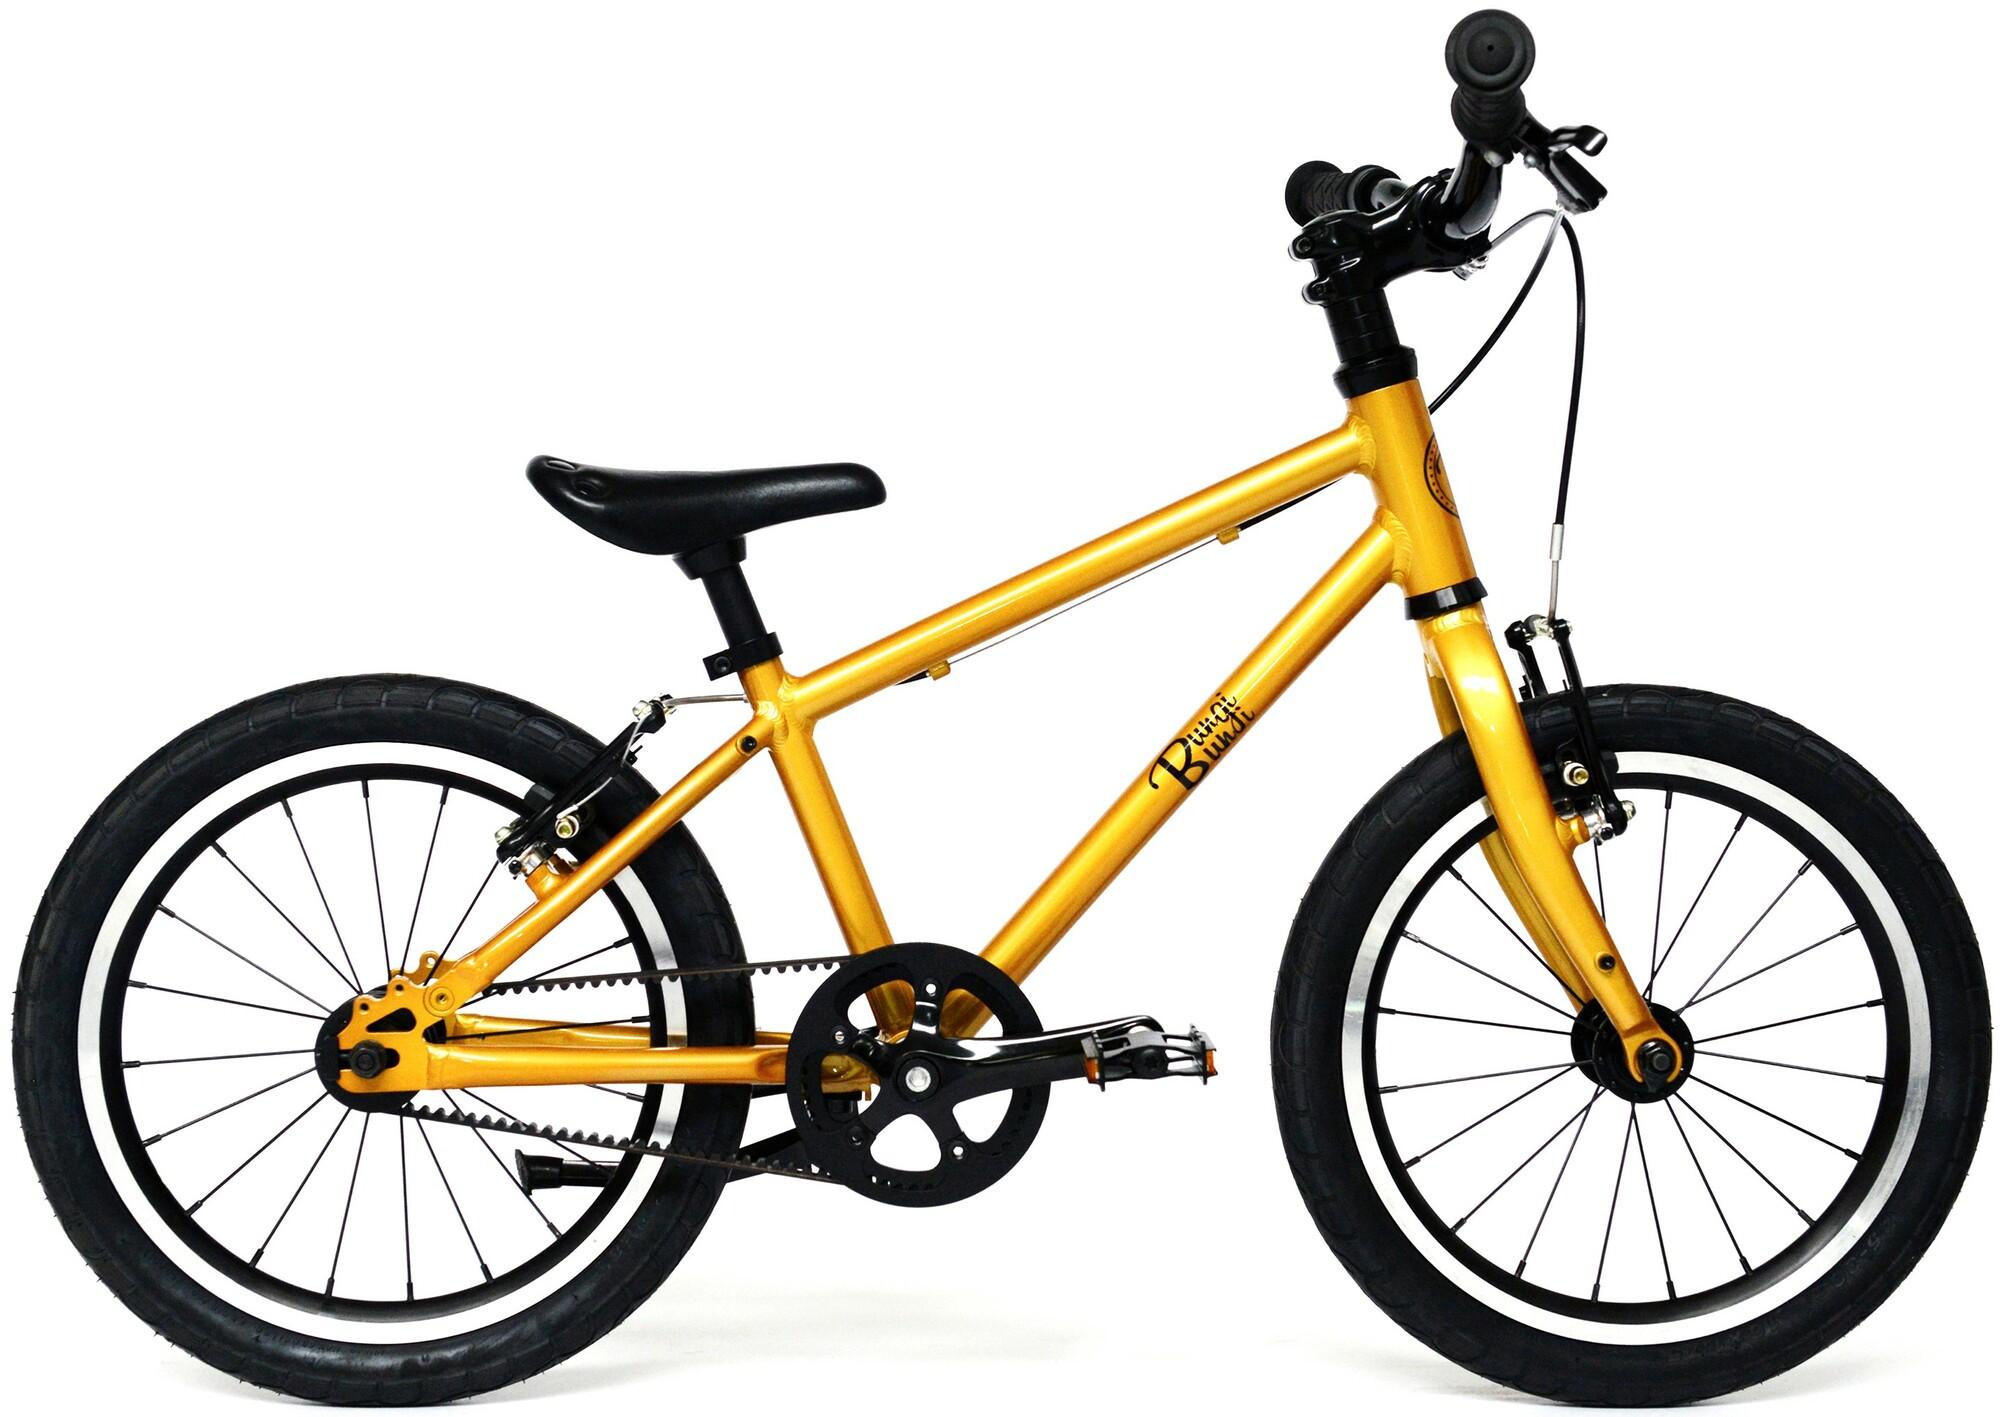 "Bungi Bungi - Detský bicykel Lite 16"" Hliníkový ultra ľahký 2019 Pineapple Yellow"